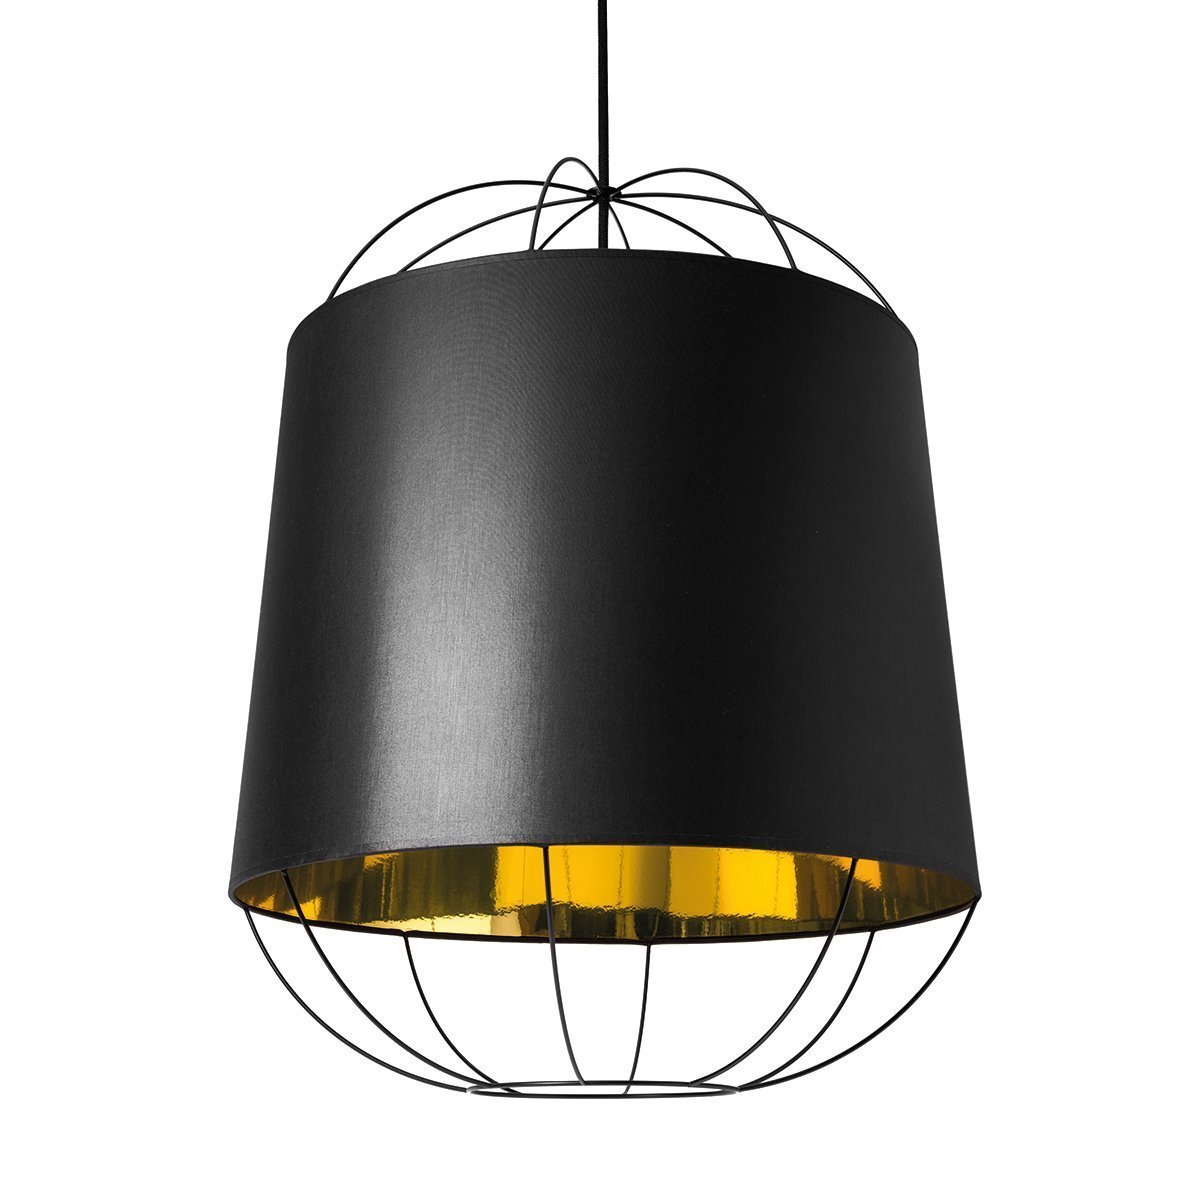 Lanterna Hanglamp Medium - Petite Friture